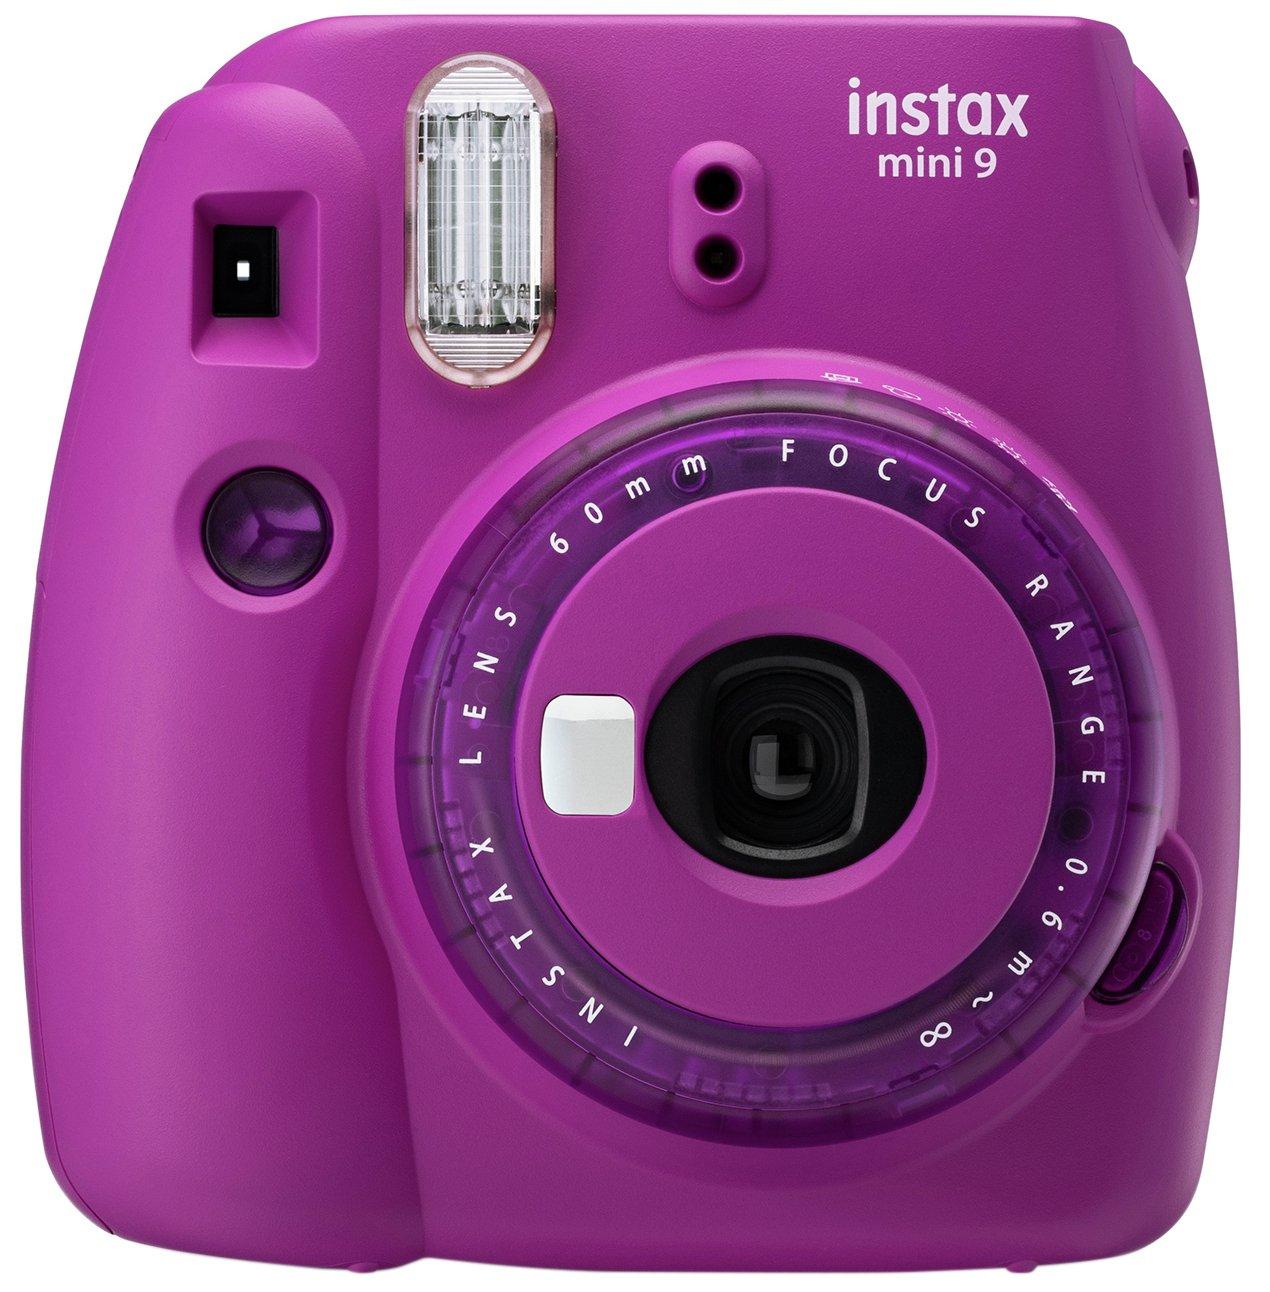 Instax Mini 9 Instant Camera - White / Pale Blue / Purple / Pink / Yellow - £44.99 @ Argos